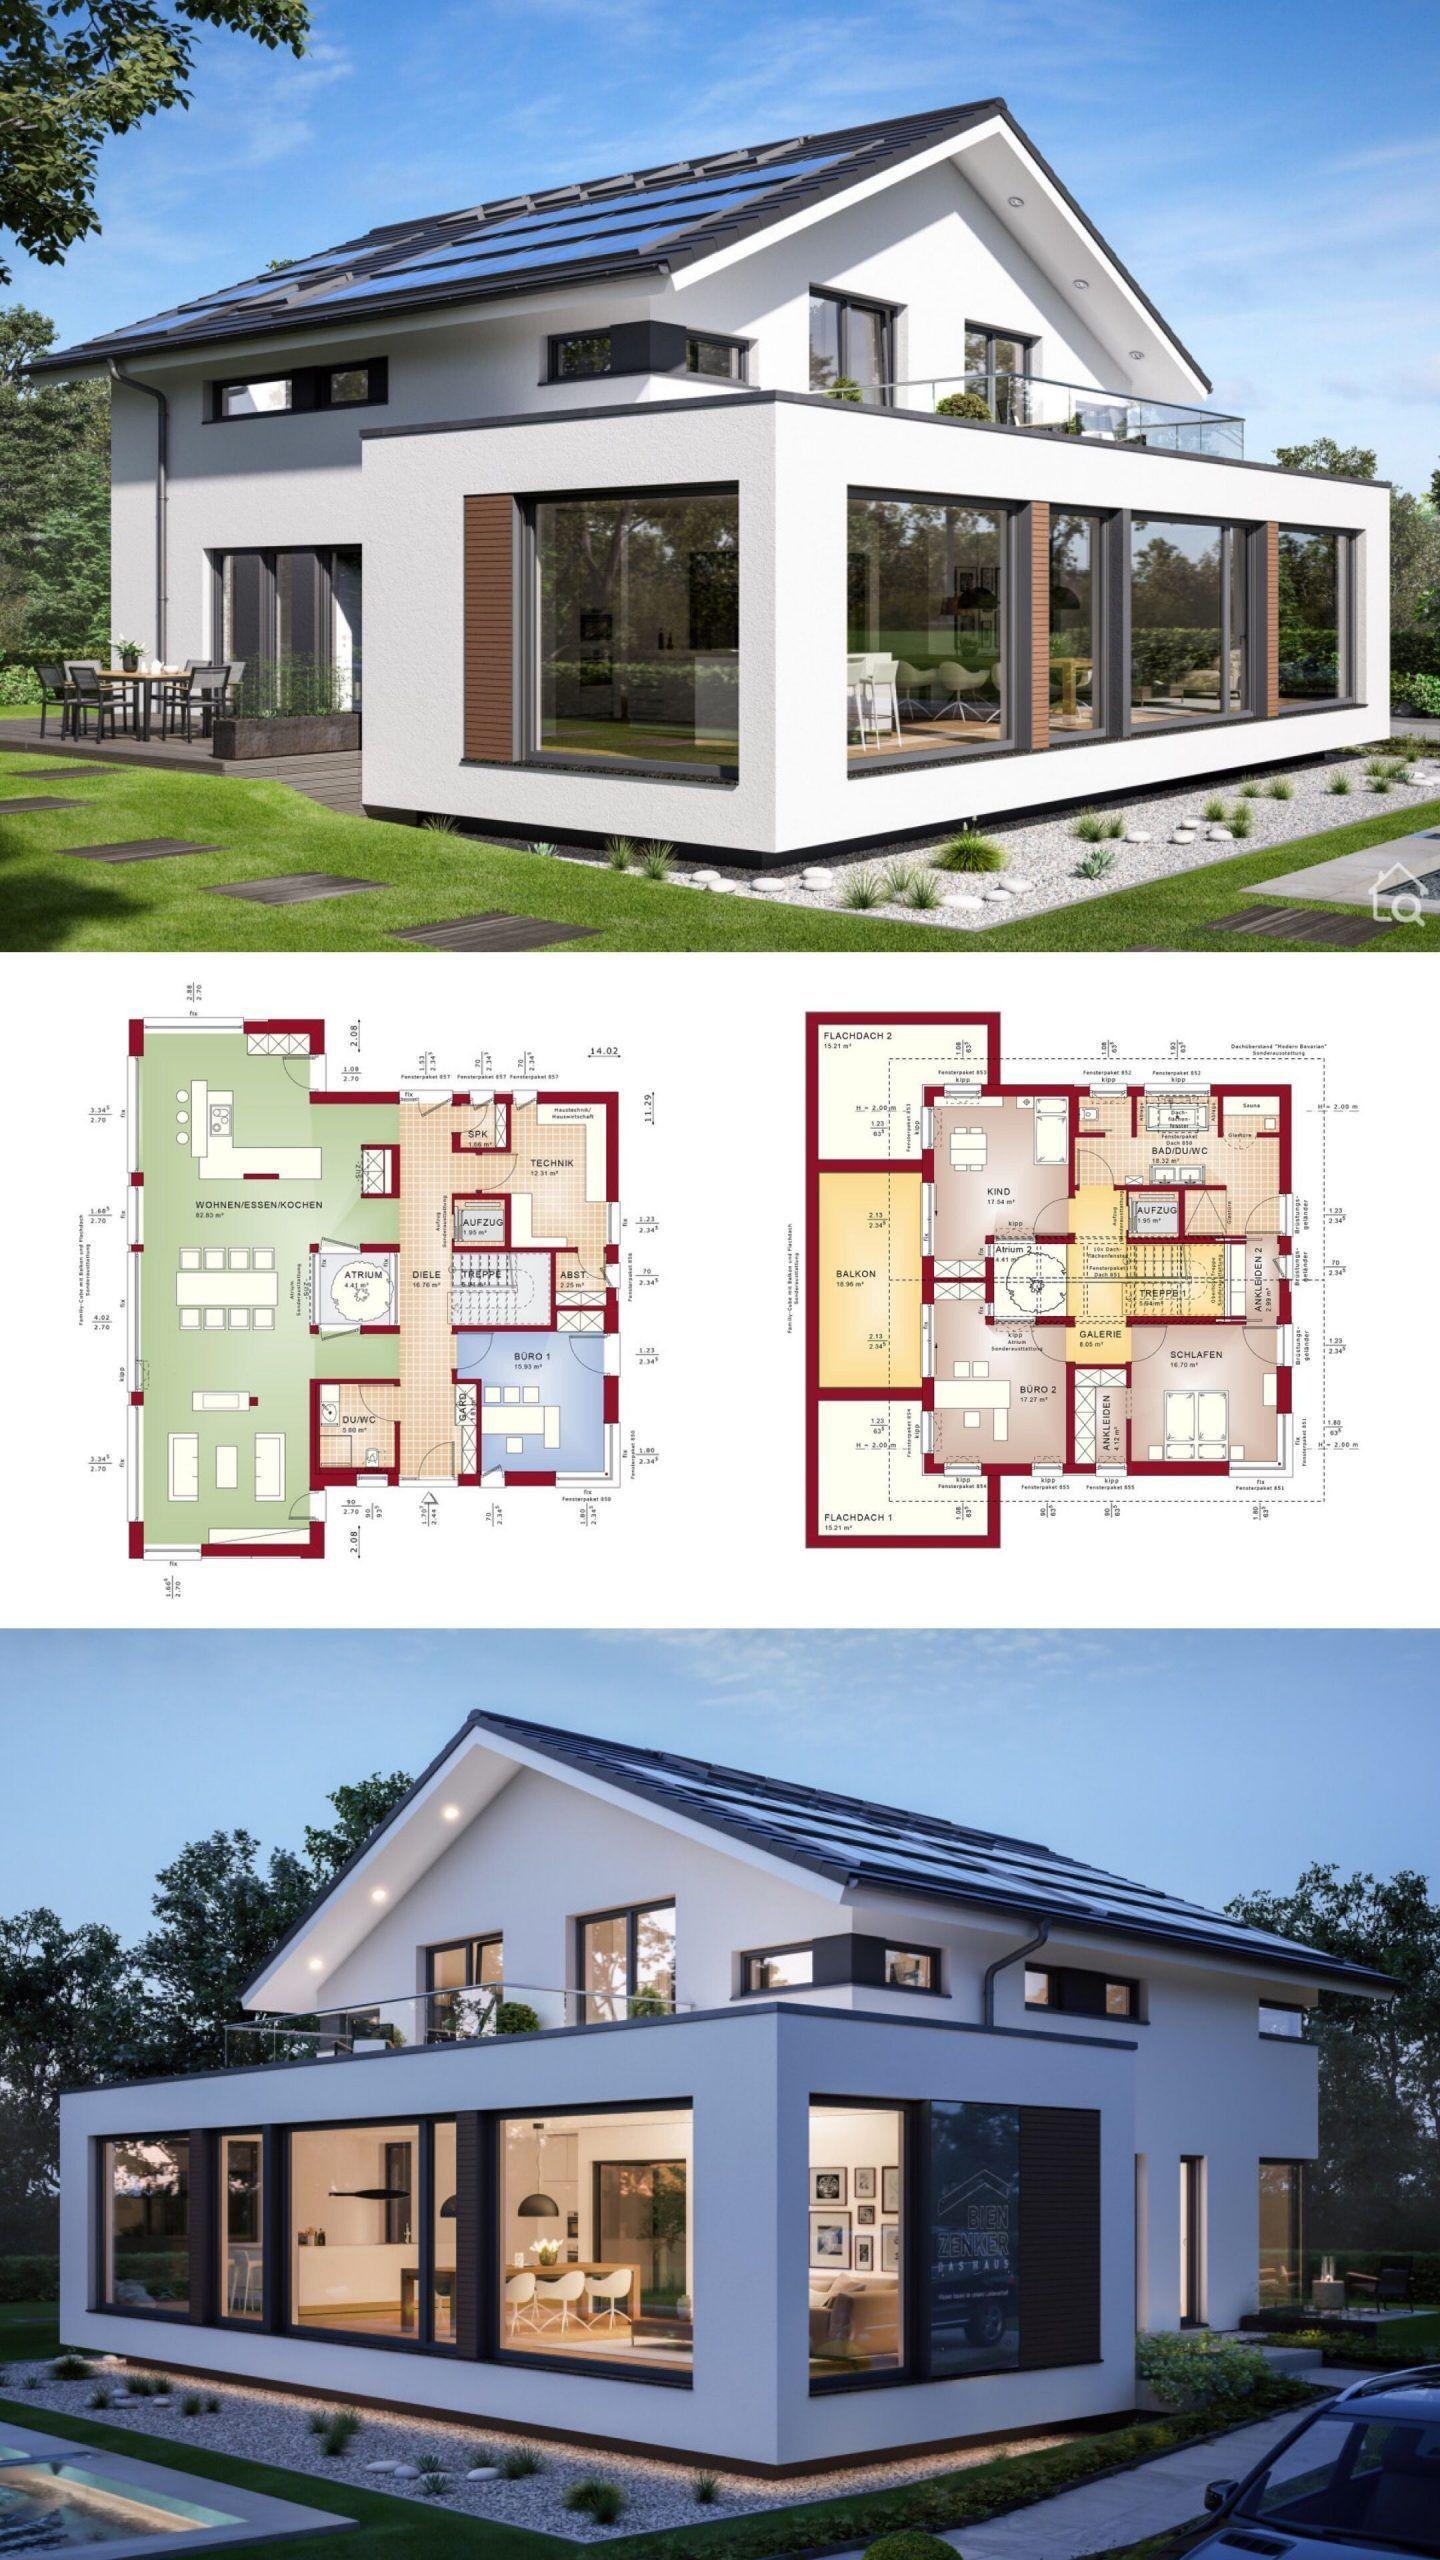 Modern House Design Concepts 2021 | Modernes haus, Haus ...